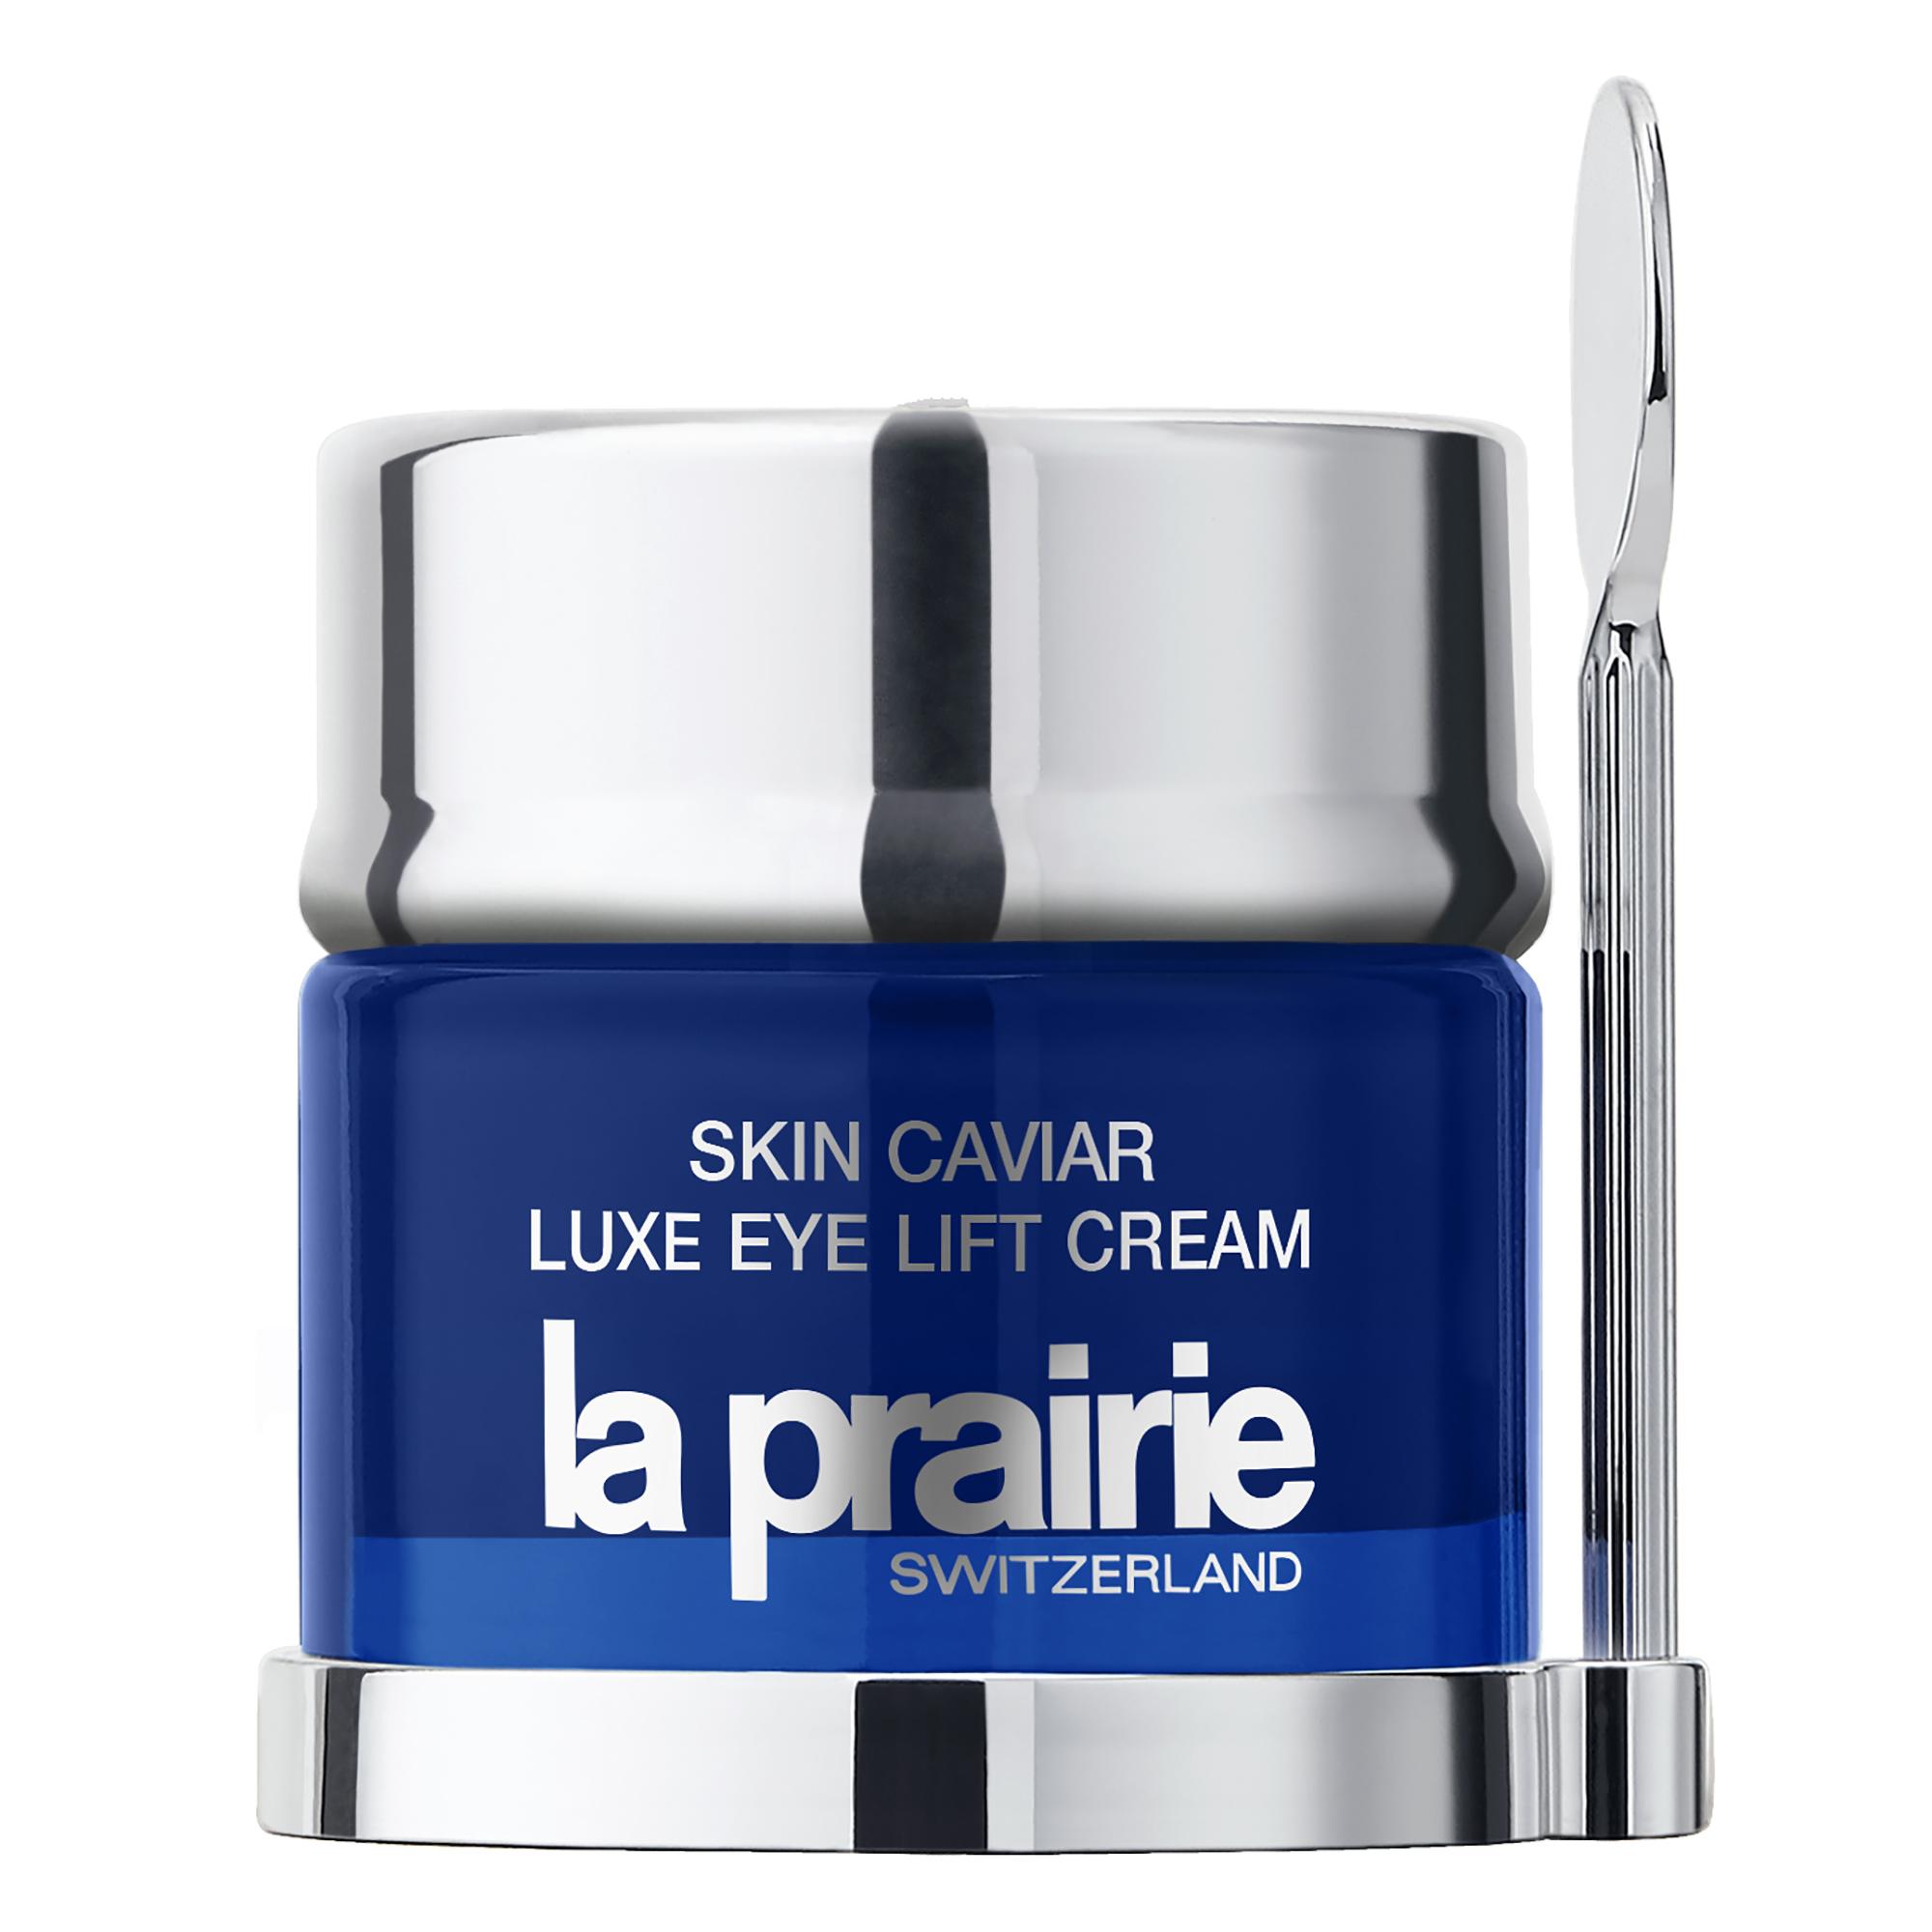 Skin Caviar Eye Lift Cream